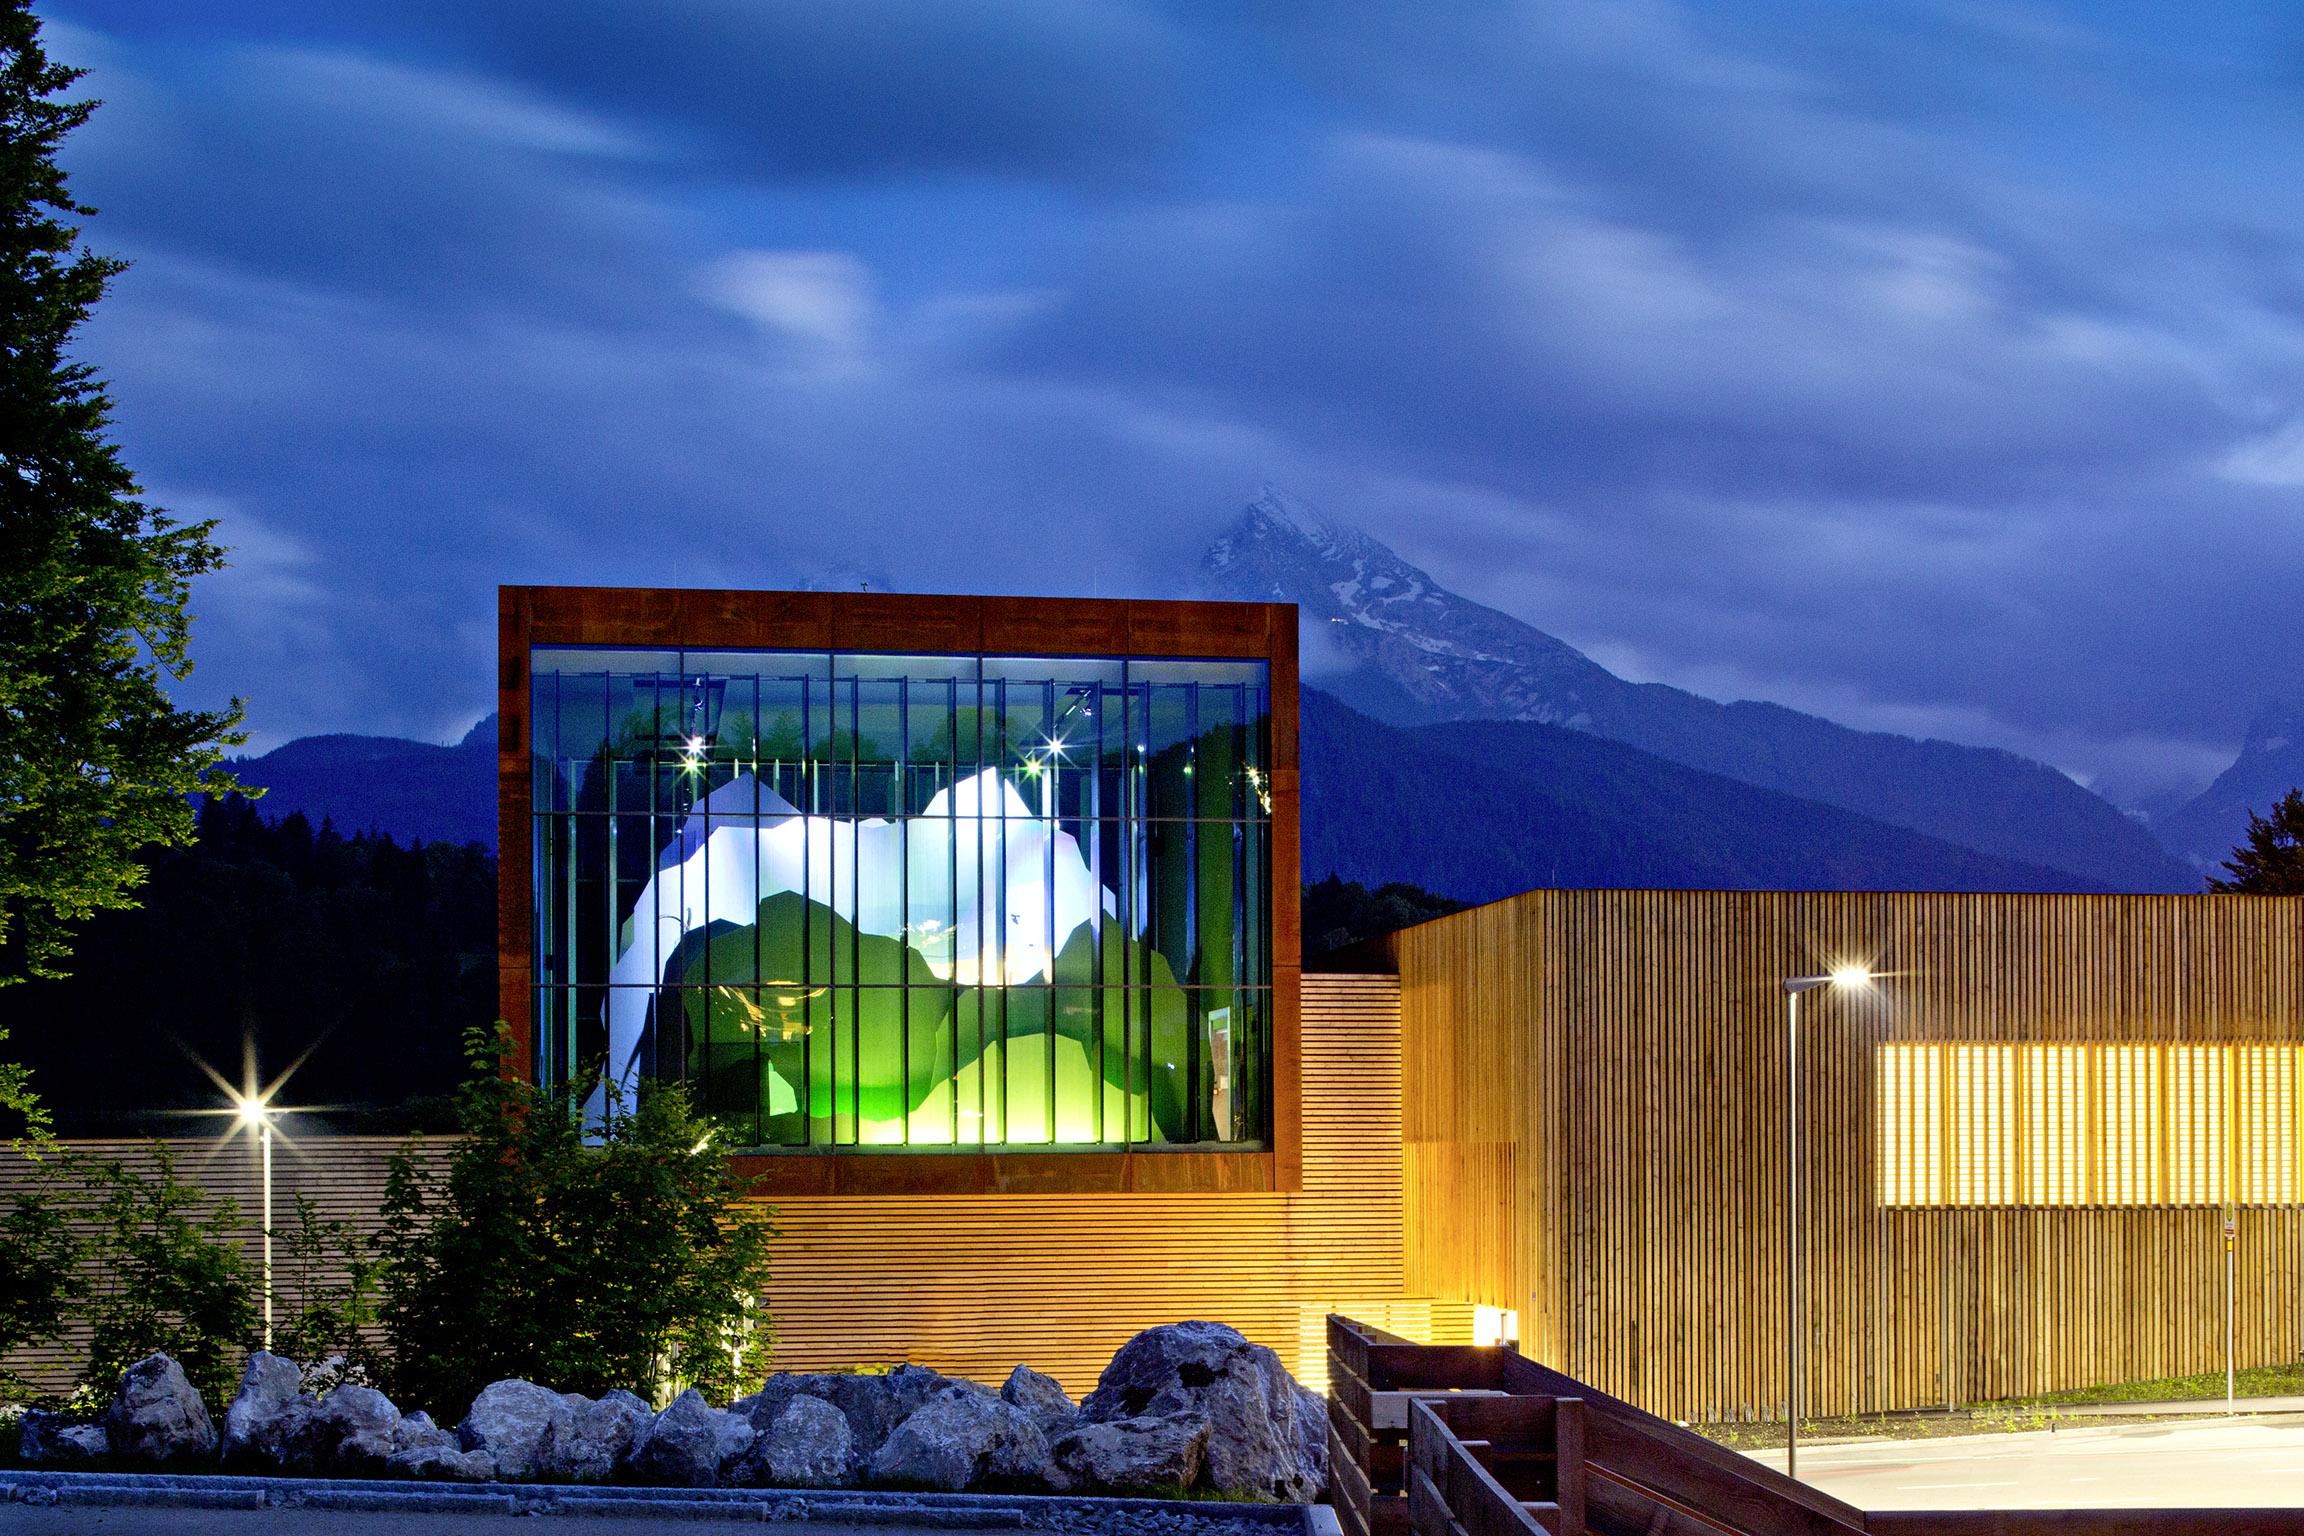 Haus der Berge